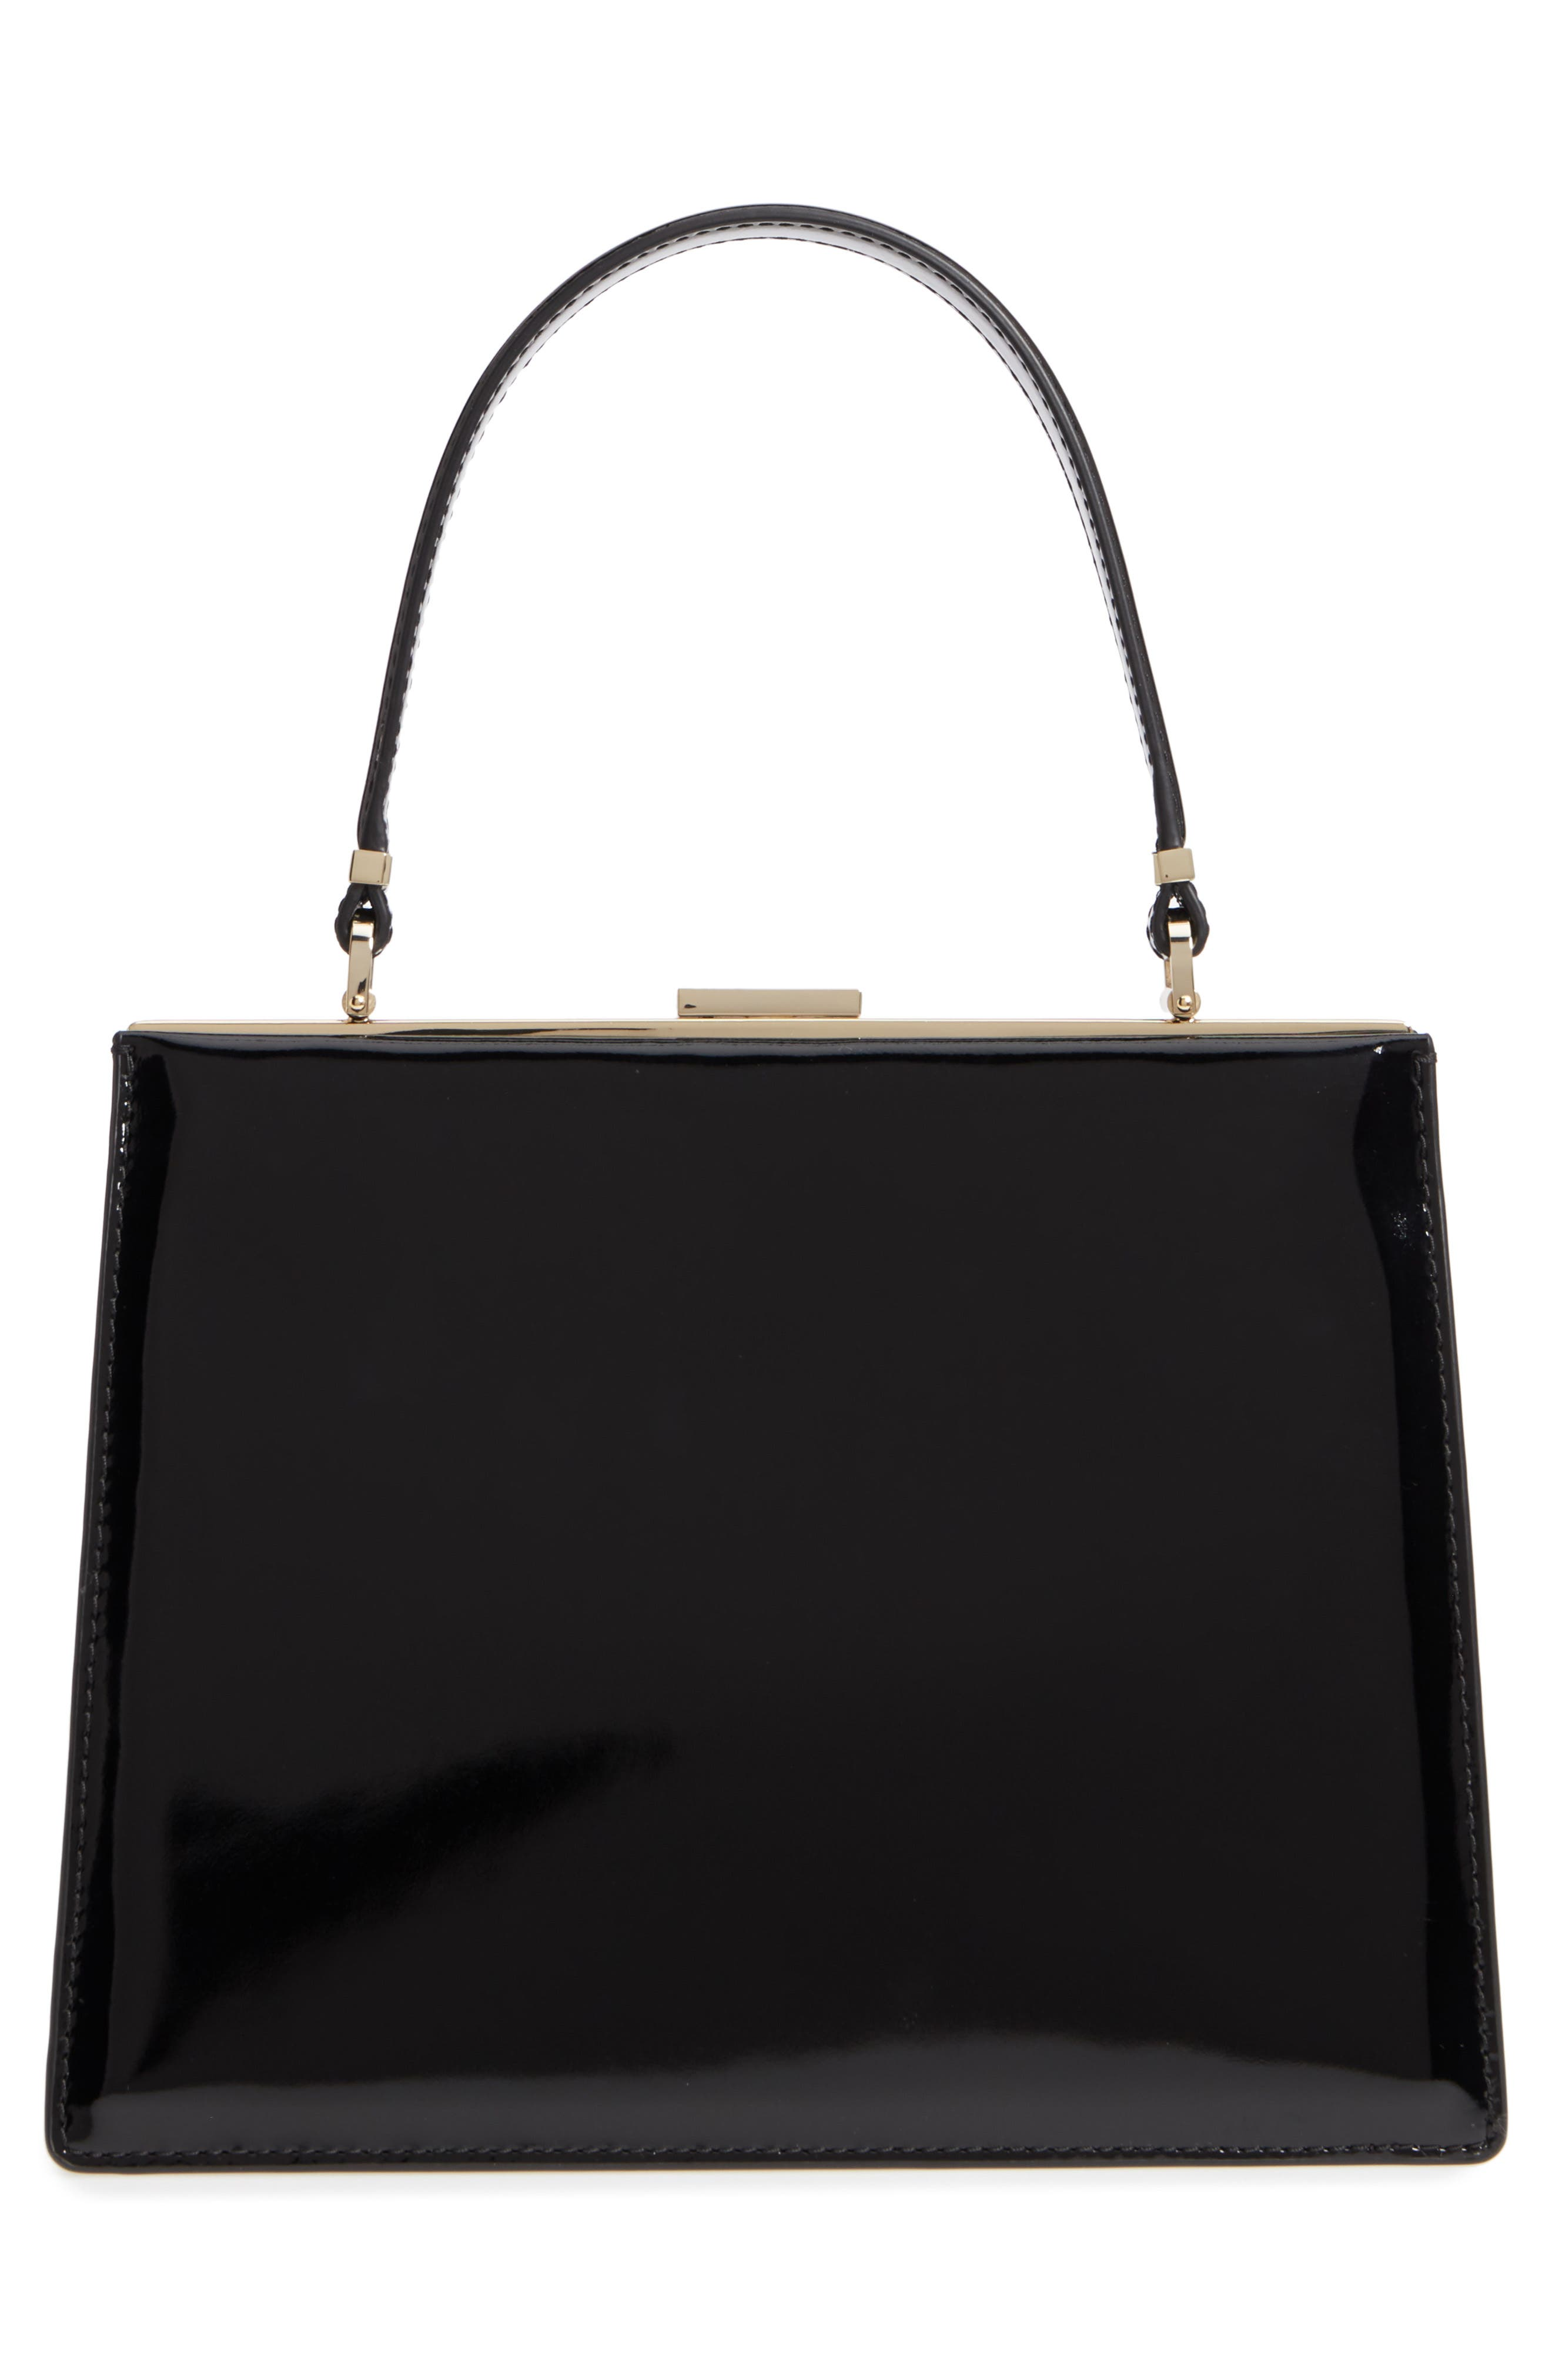 KATE SPADE NEW YORK,                             madison moore road - chari leather handbag,                             Alternate thumbnail 3, color,                             001